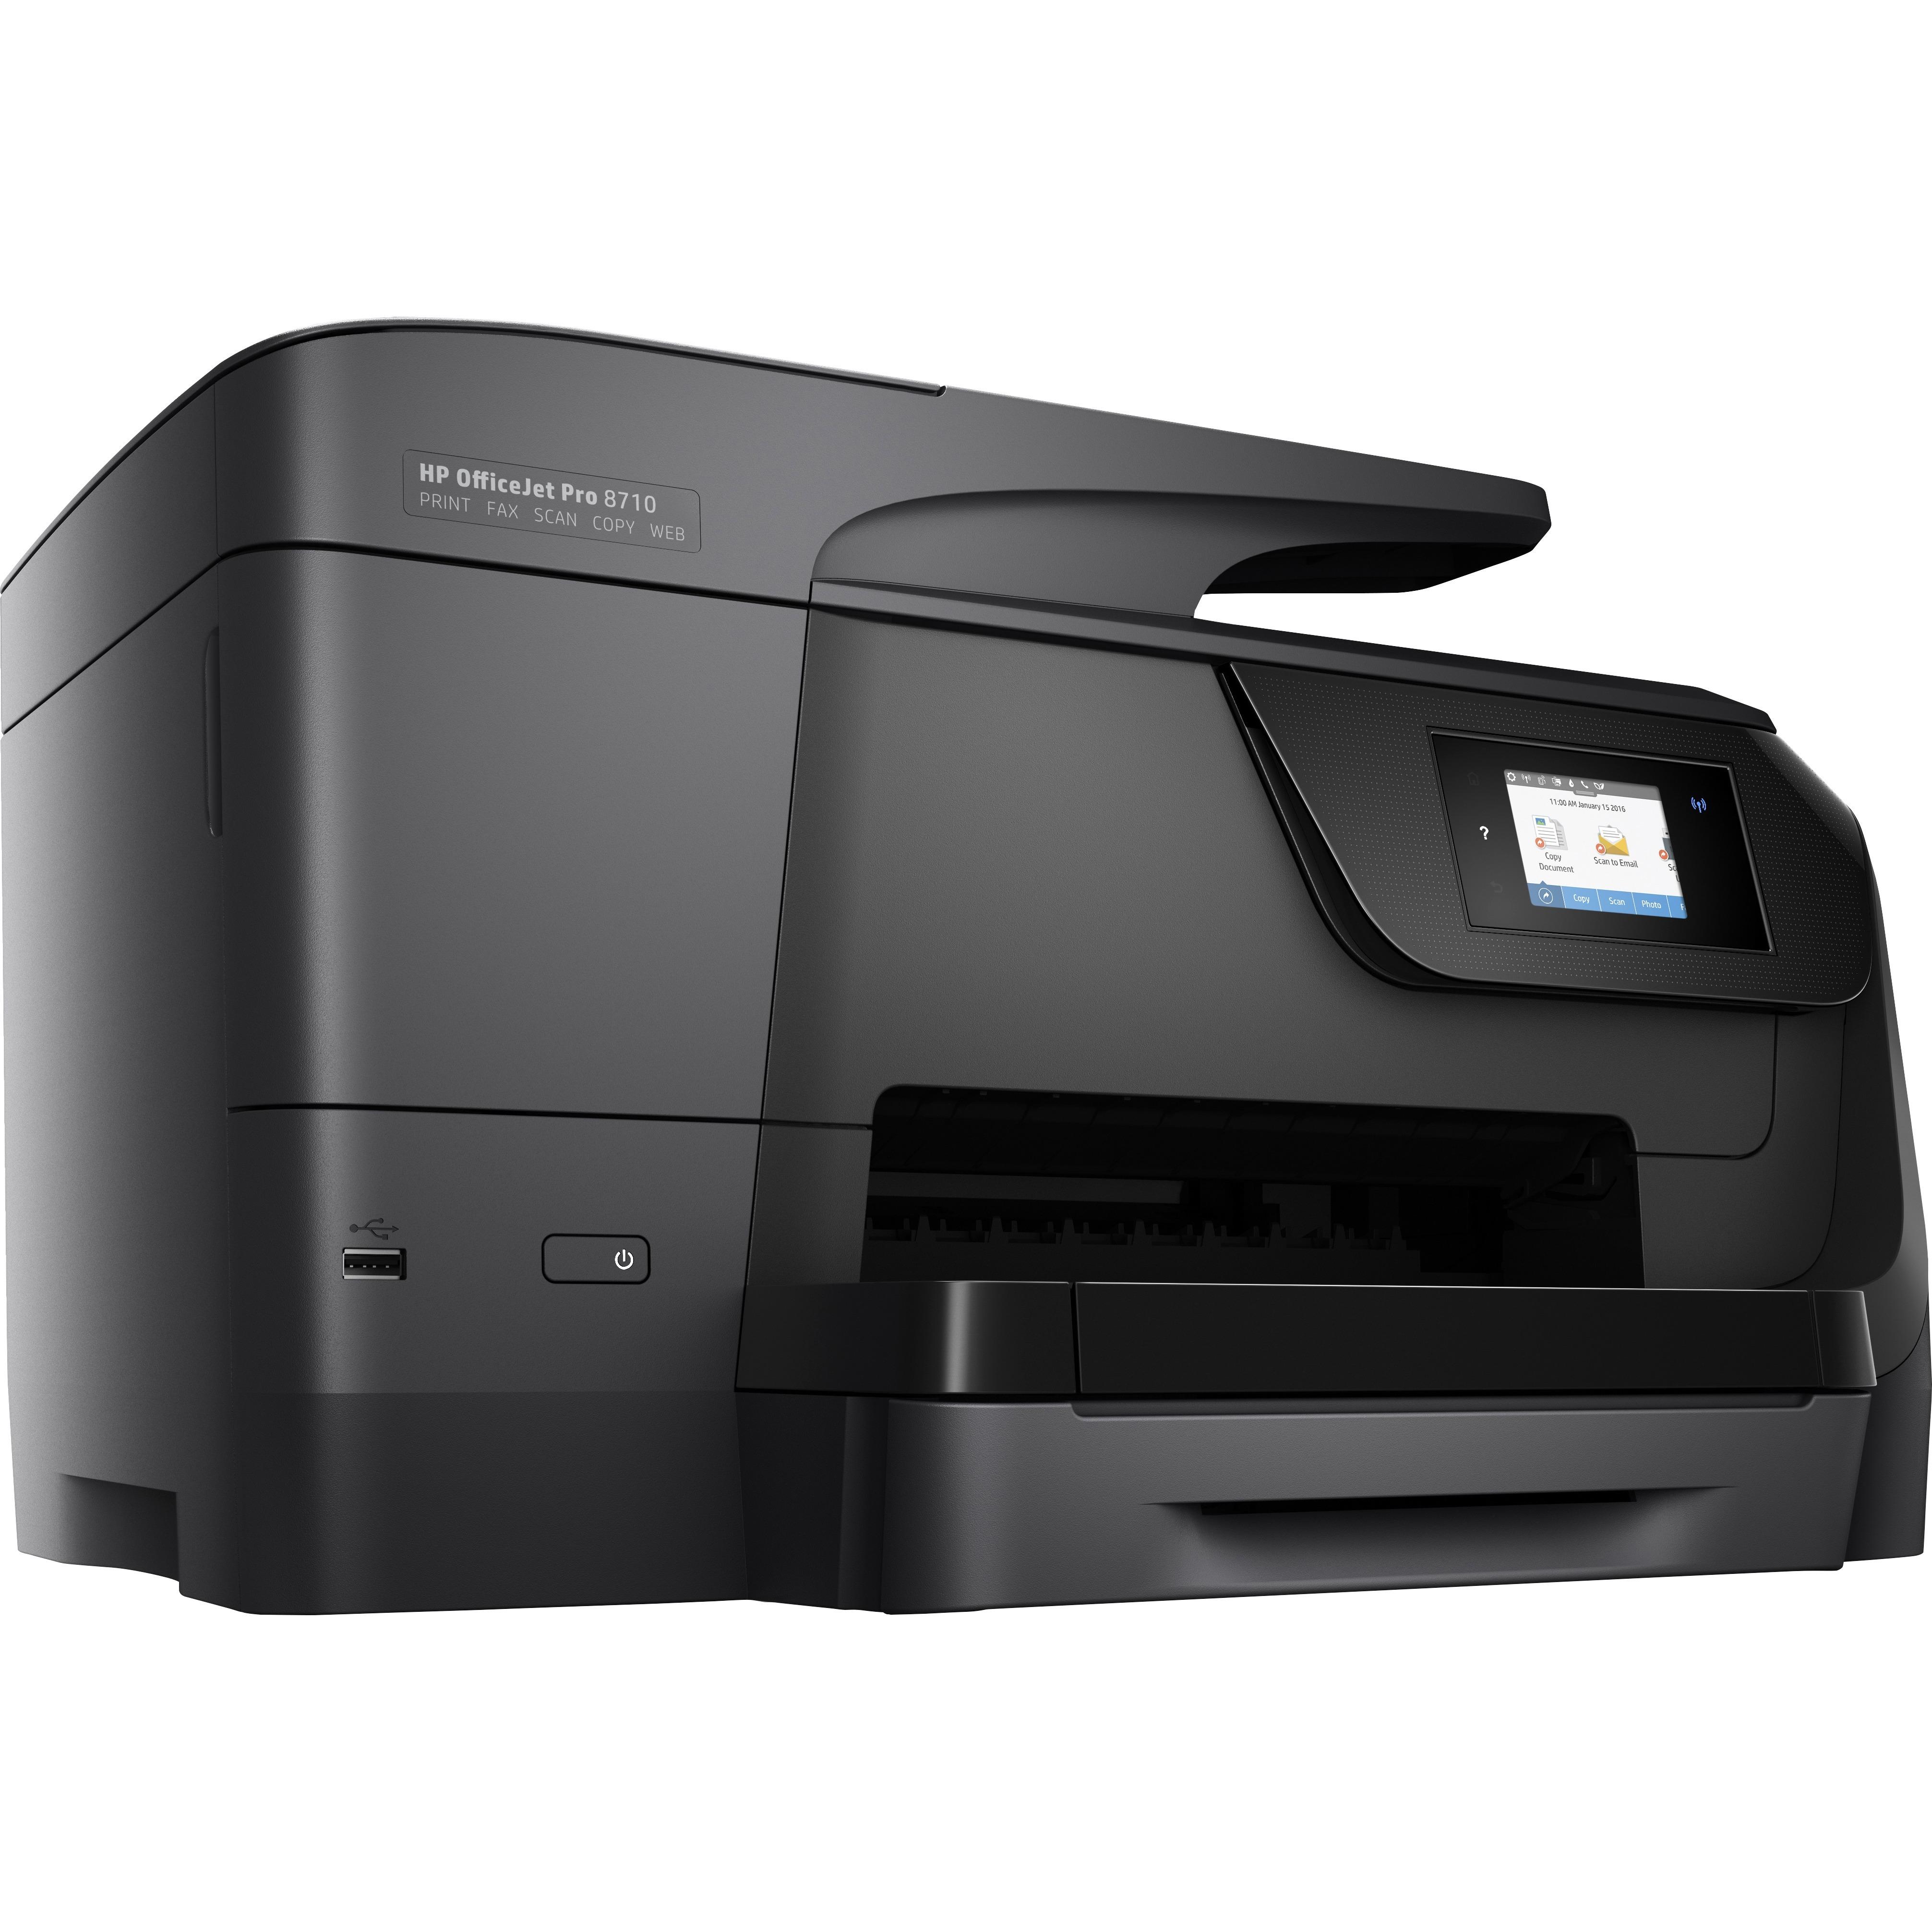 HP Officejet Pro 8710 Inkjet Multifunction Printer - Color --HEWM9L66A